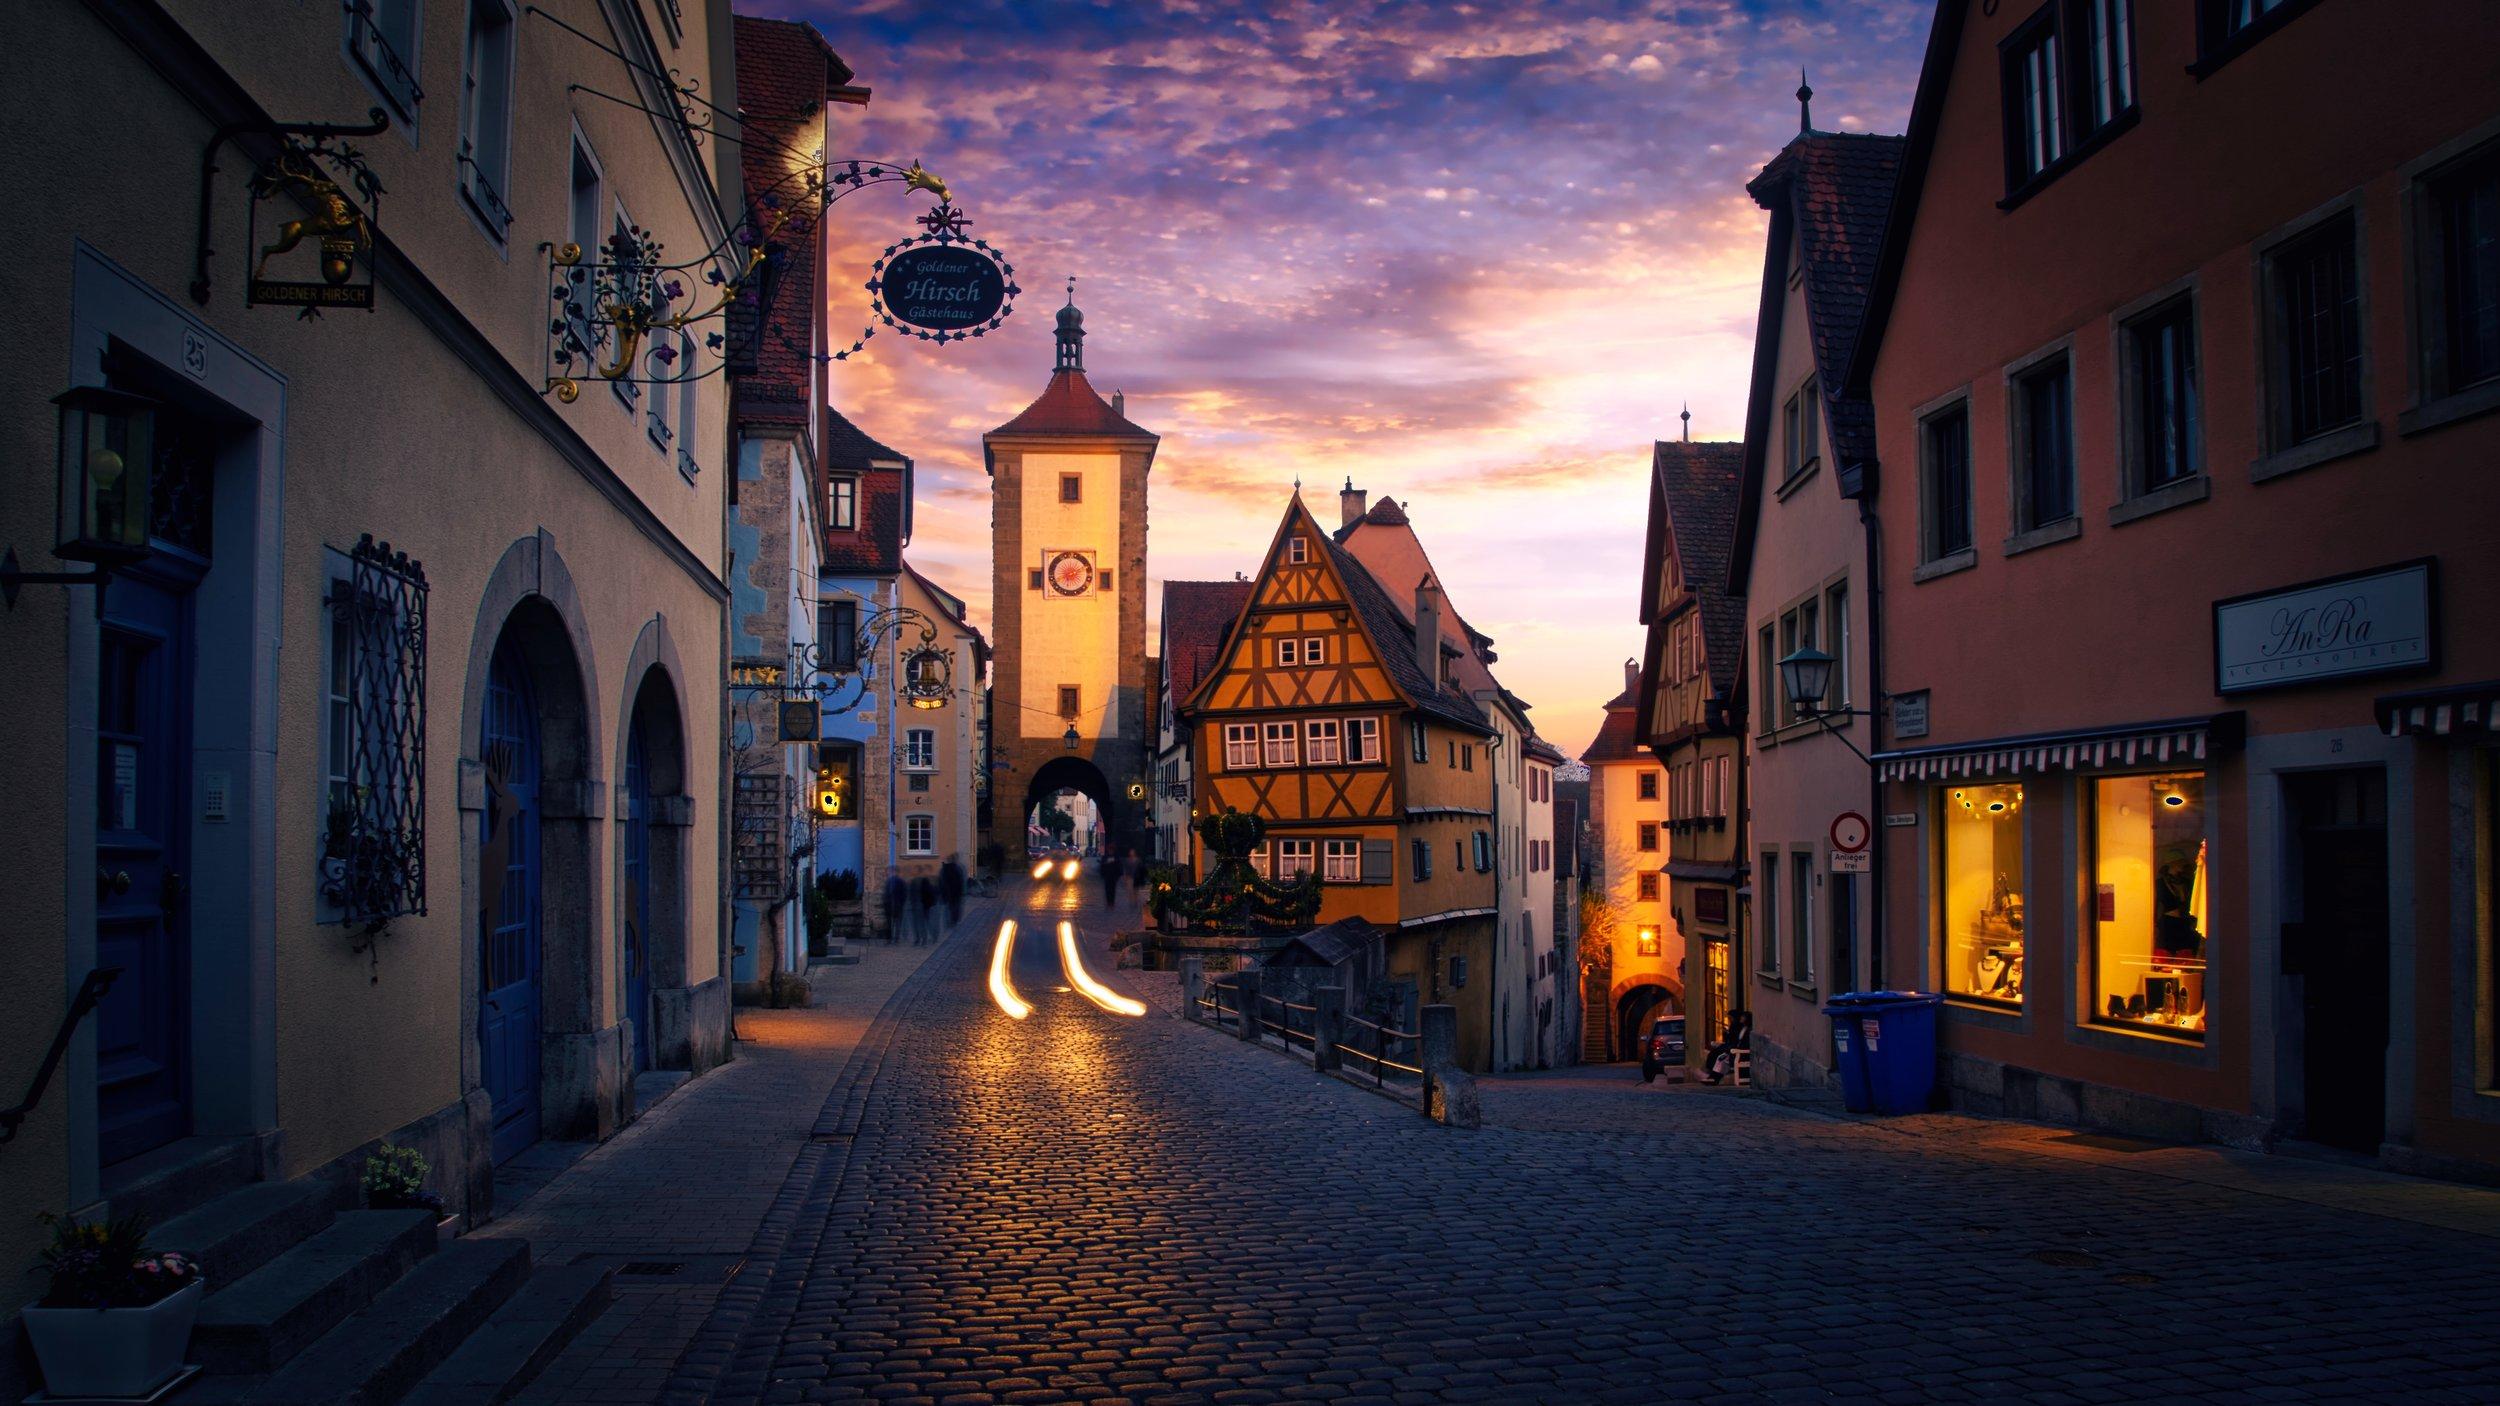 Germany-Rothenburg-newsky1.jpeg